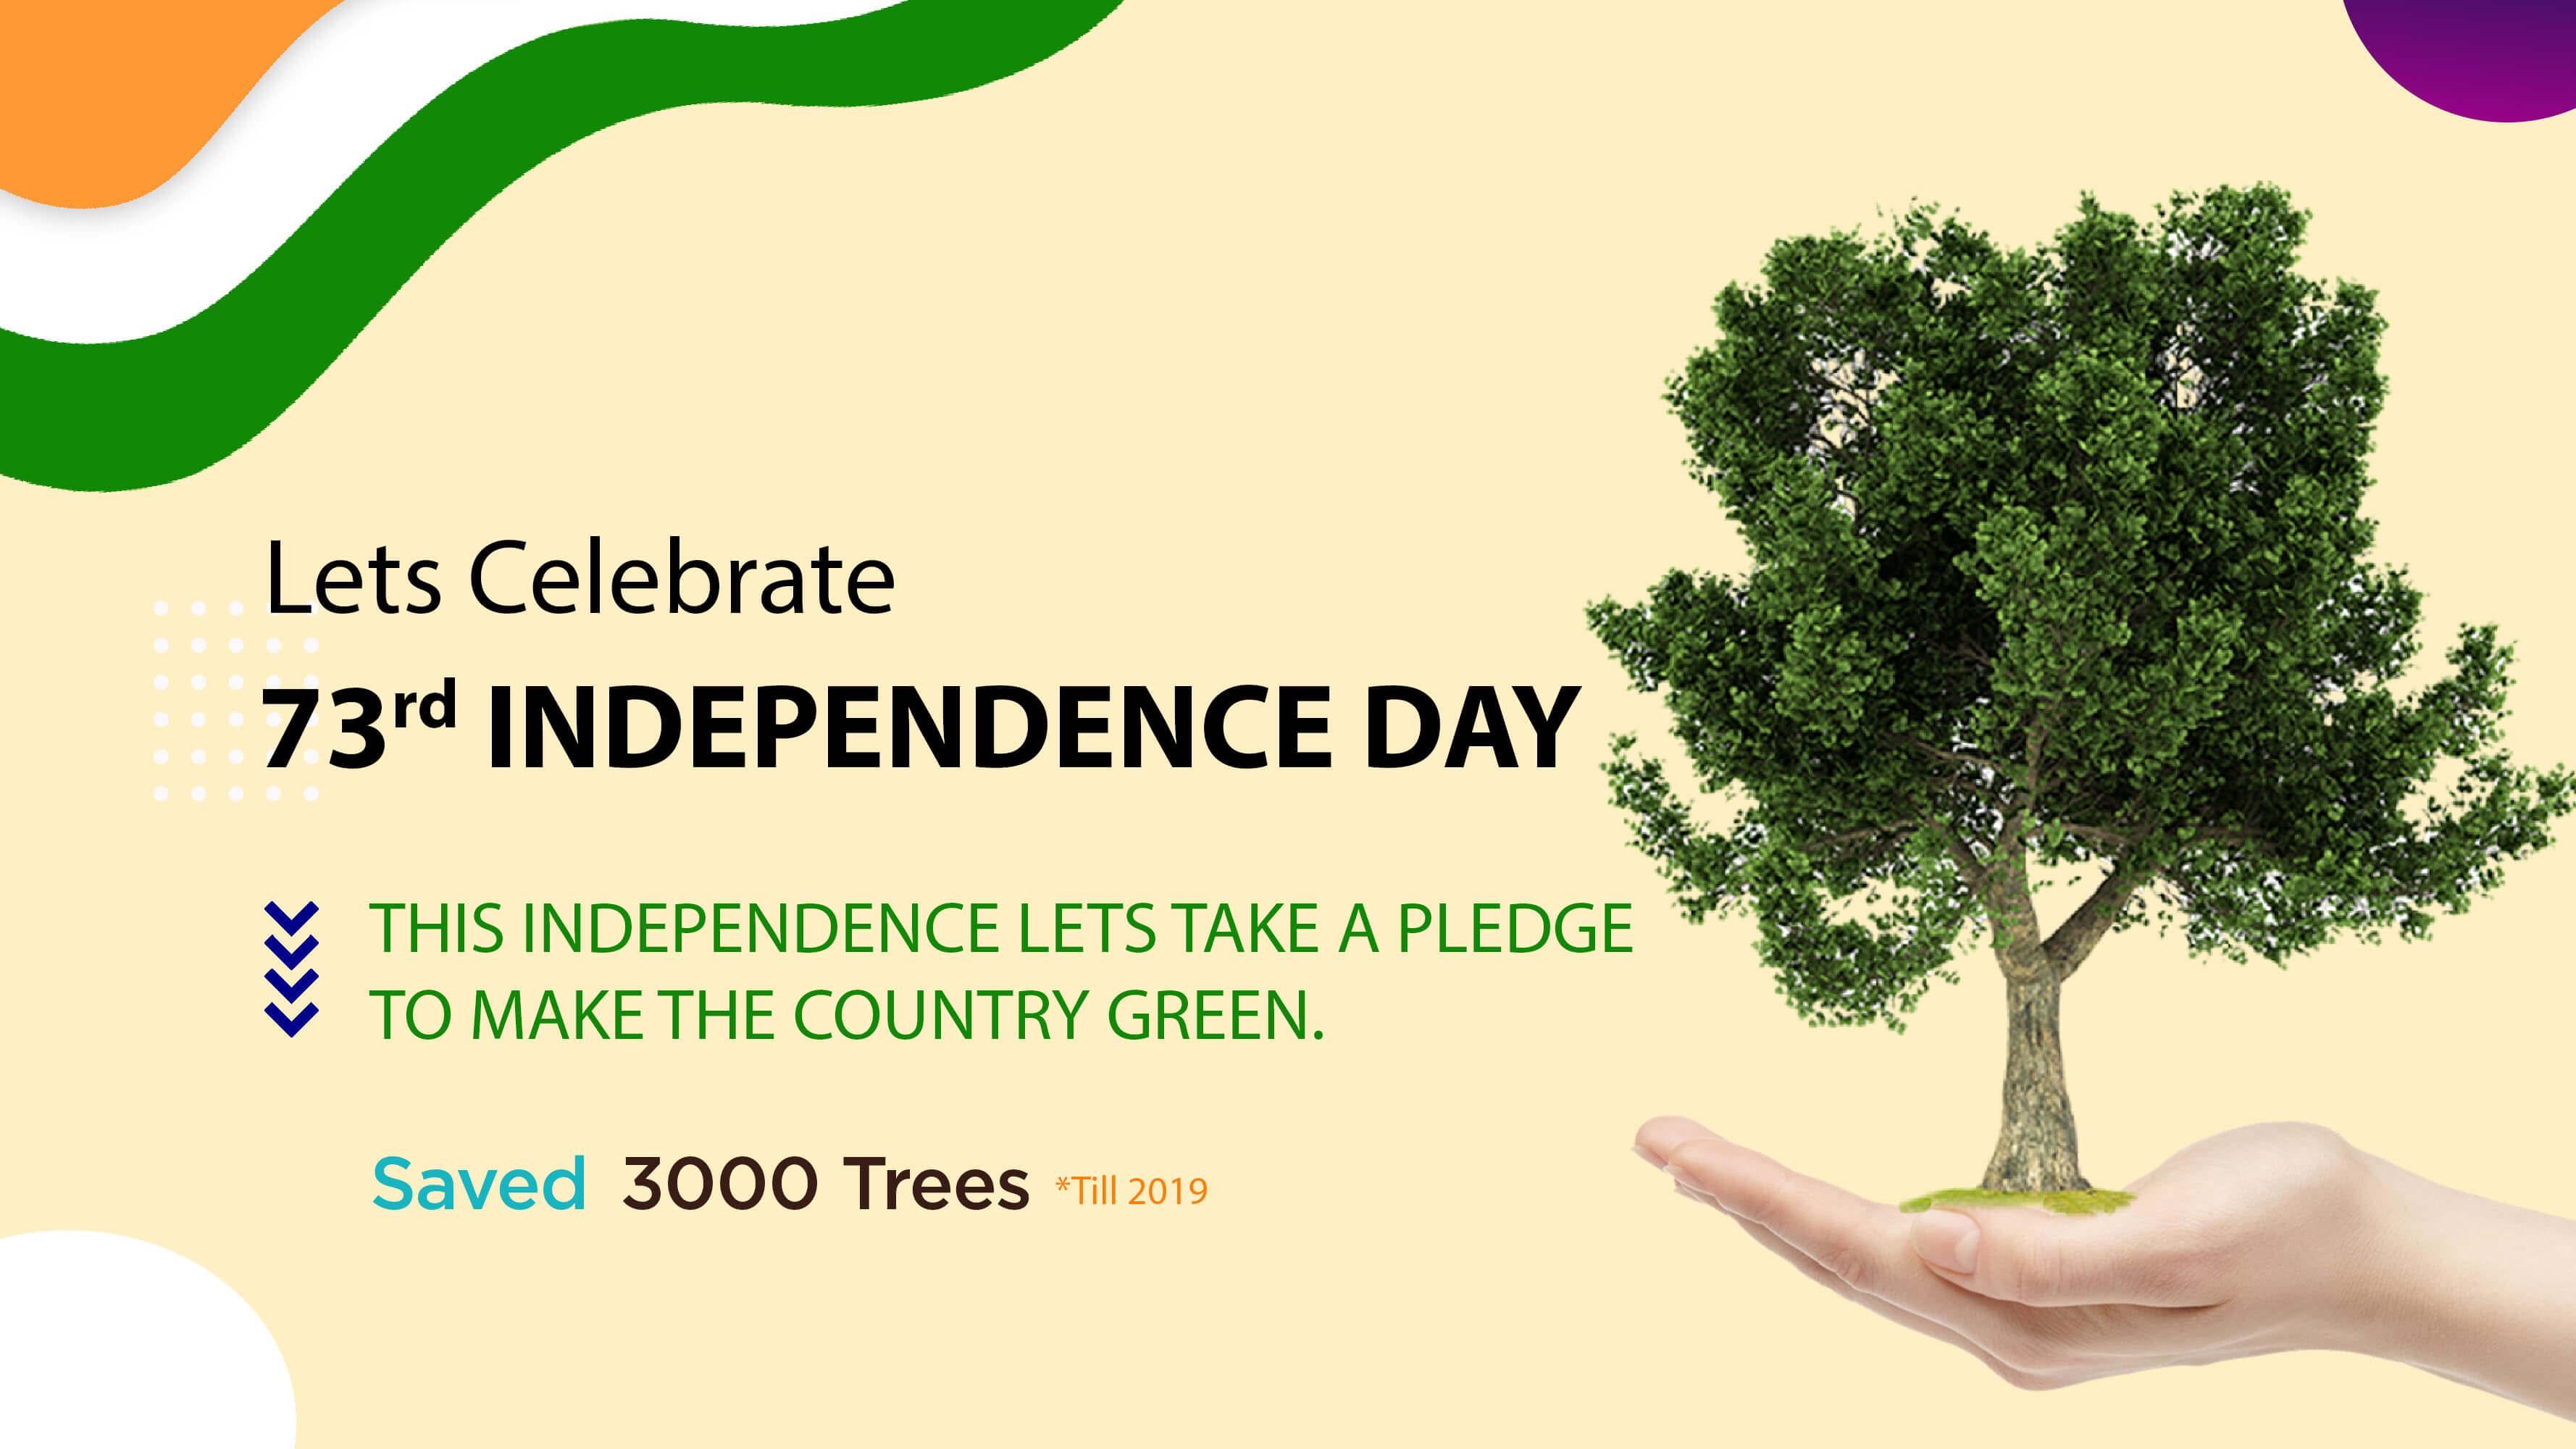 Celebrate Greener 73rd Independence Day With Kopykitab